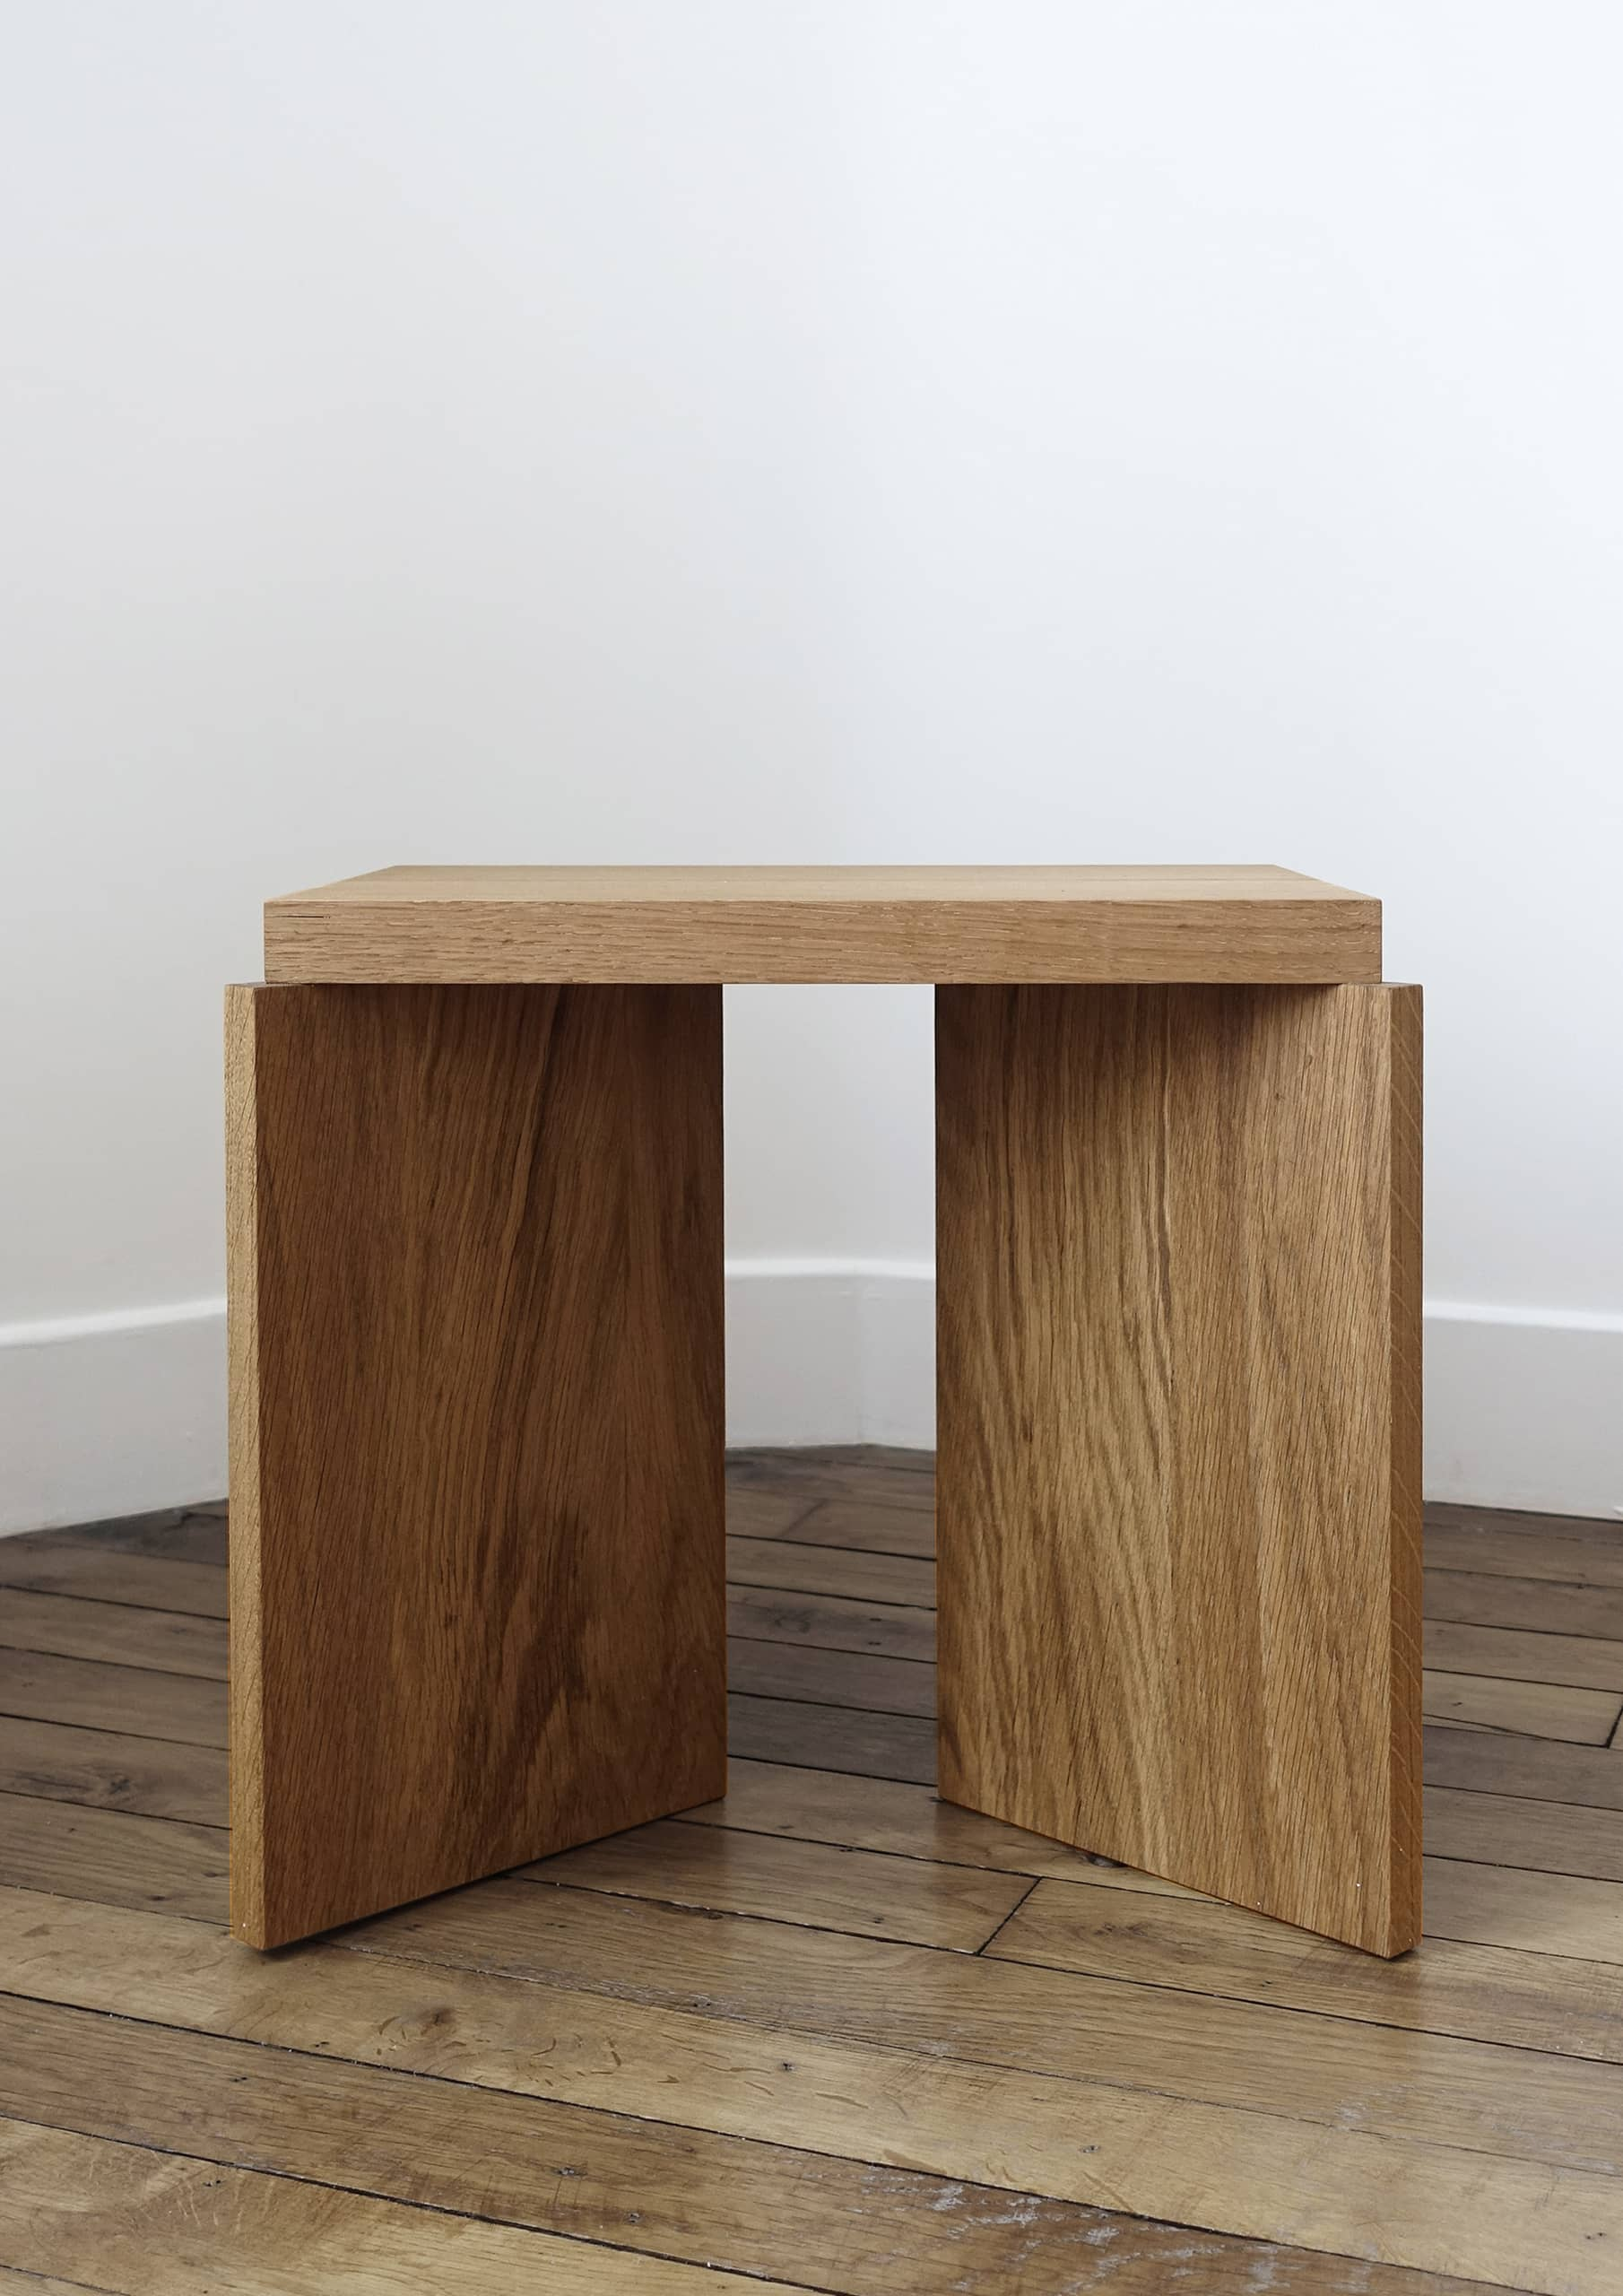 figures_ile_furniture_stool_small_serie